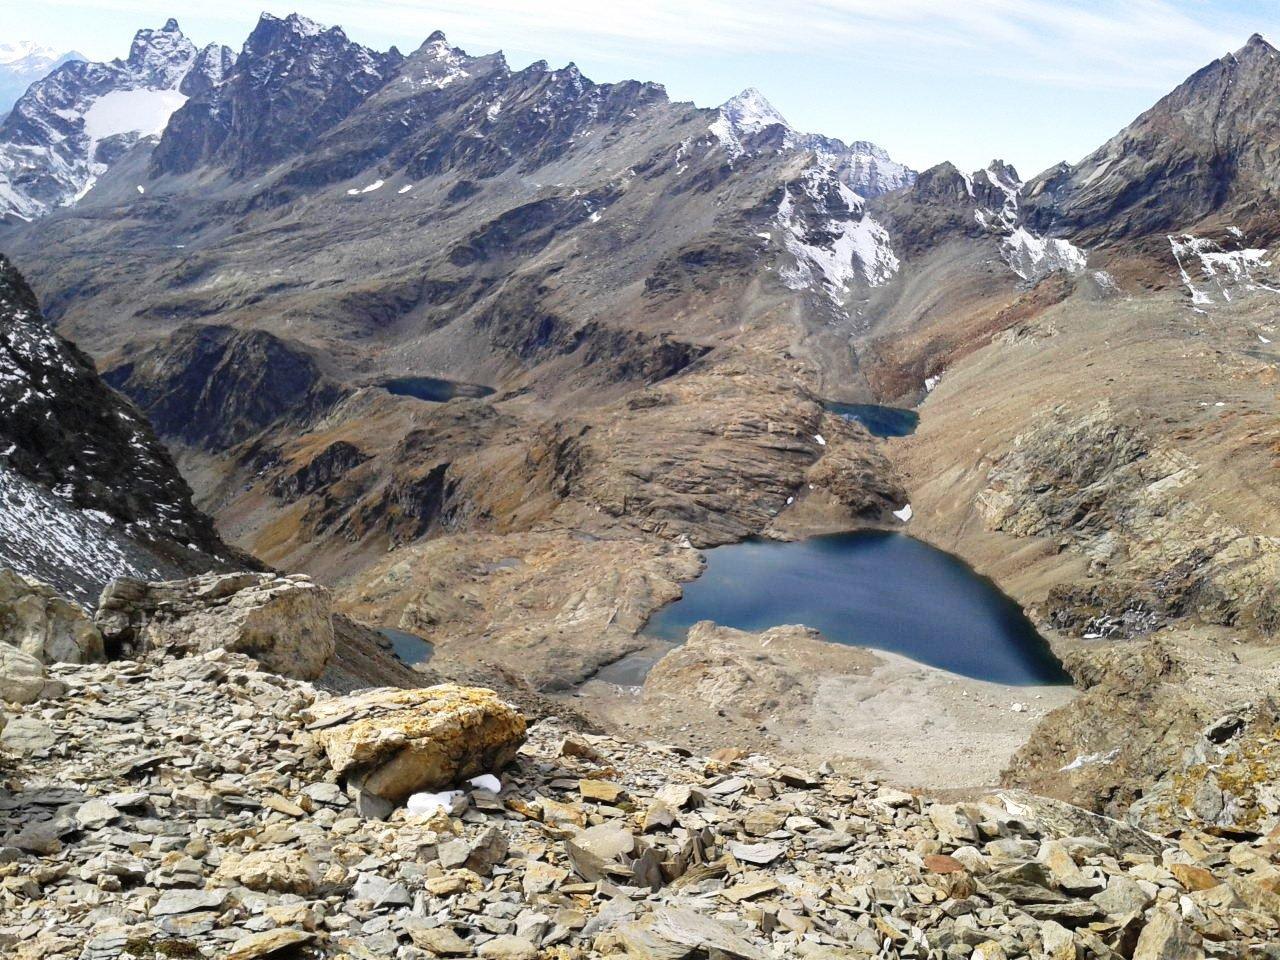 I laghi visti dal colle Vofrède